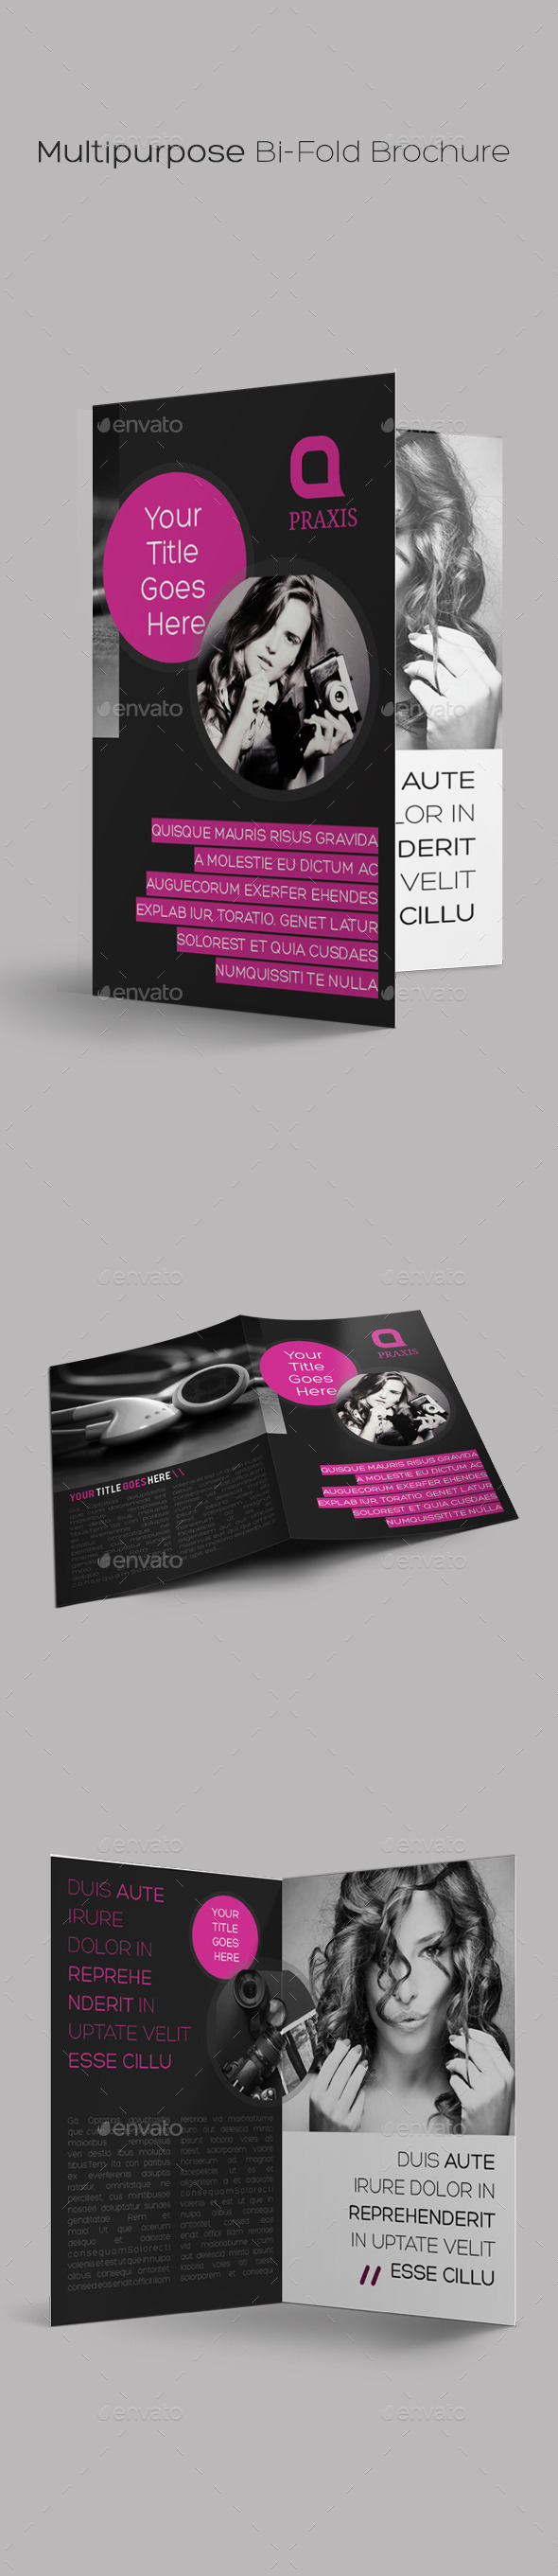 Multipurpose Bi-Fold Brochure - Brochures Print Templates